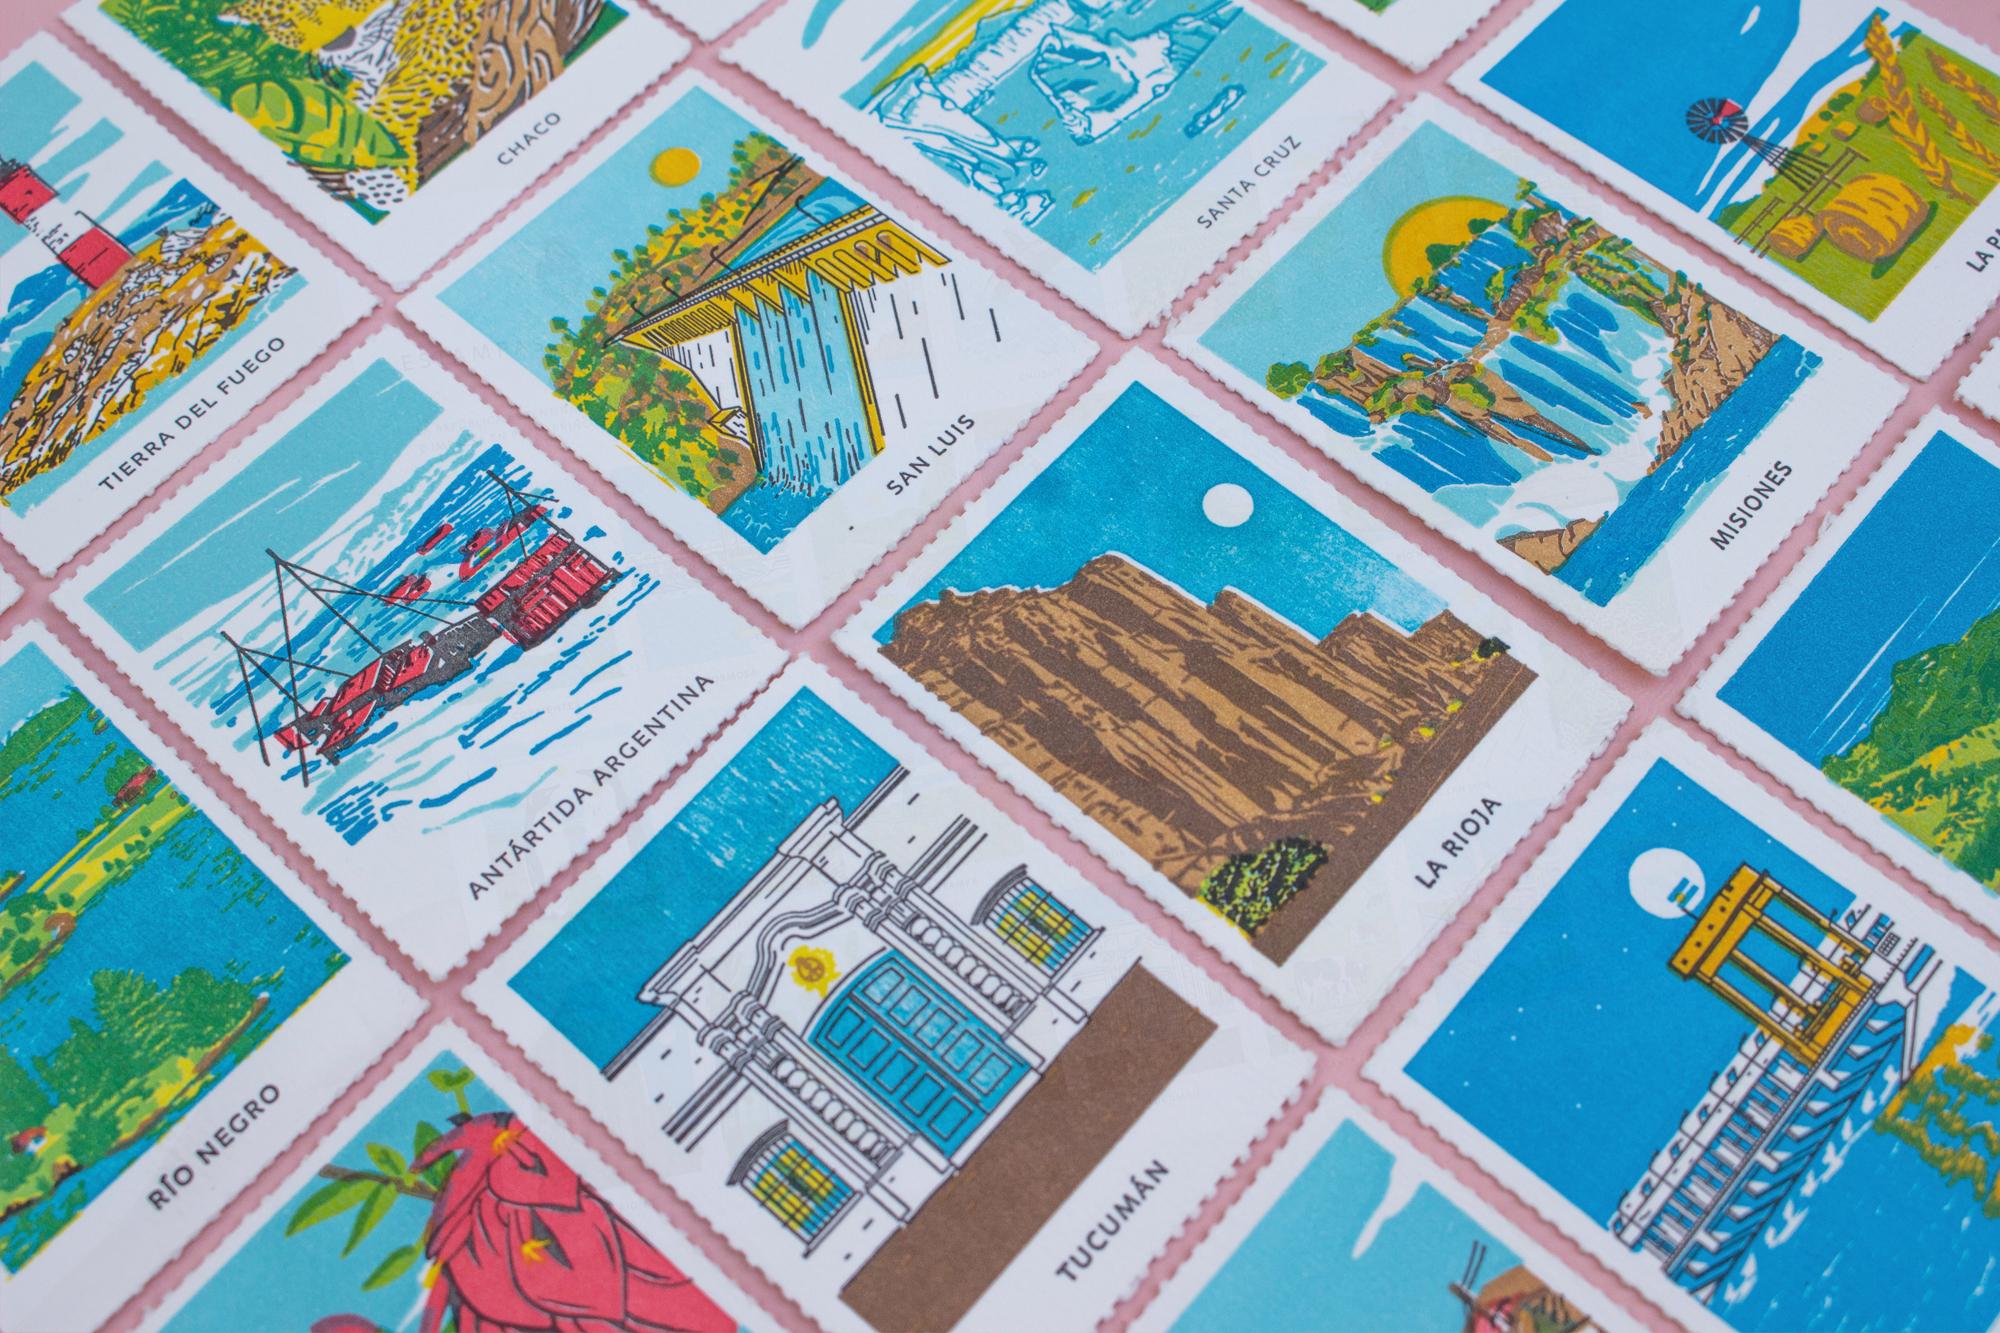 2-estampas-argentinas-juan-geist-papel-principal-letterpress-imprenta-tipografica-artesanal.jpg